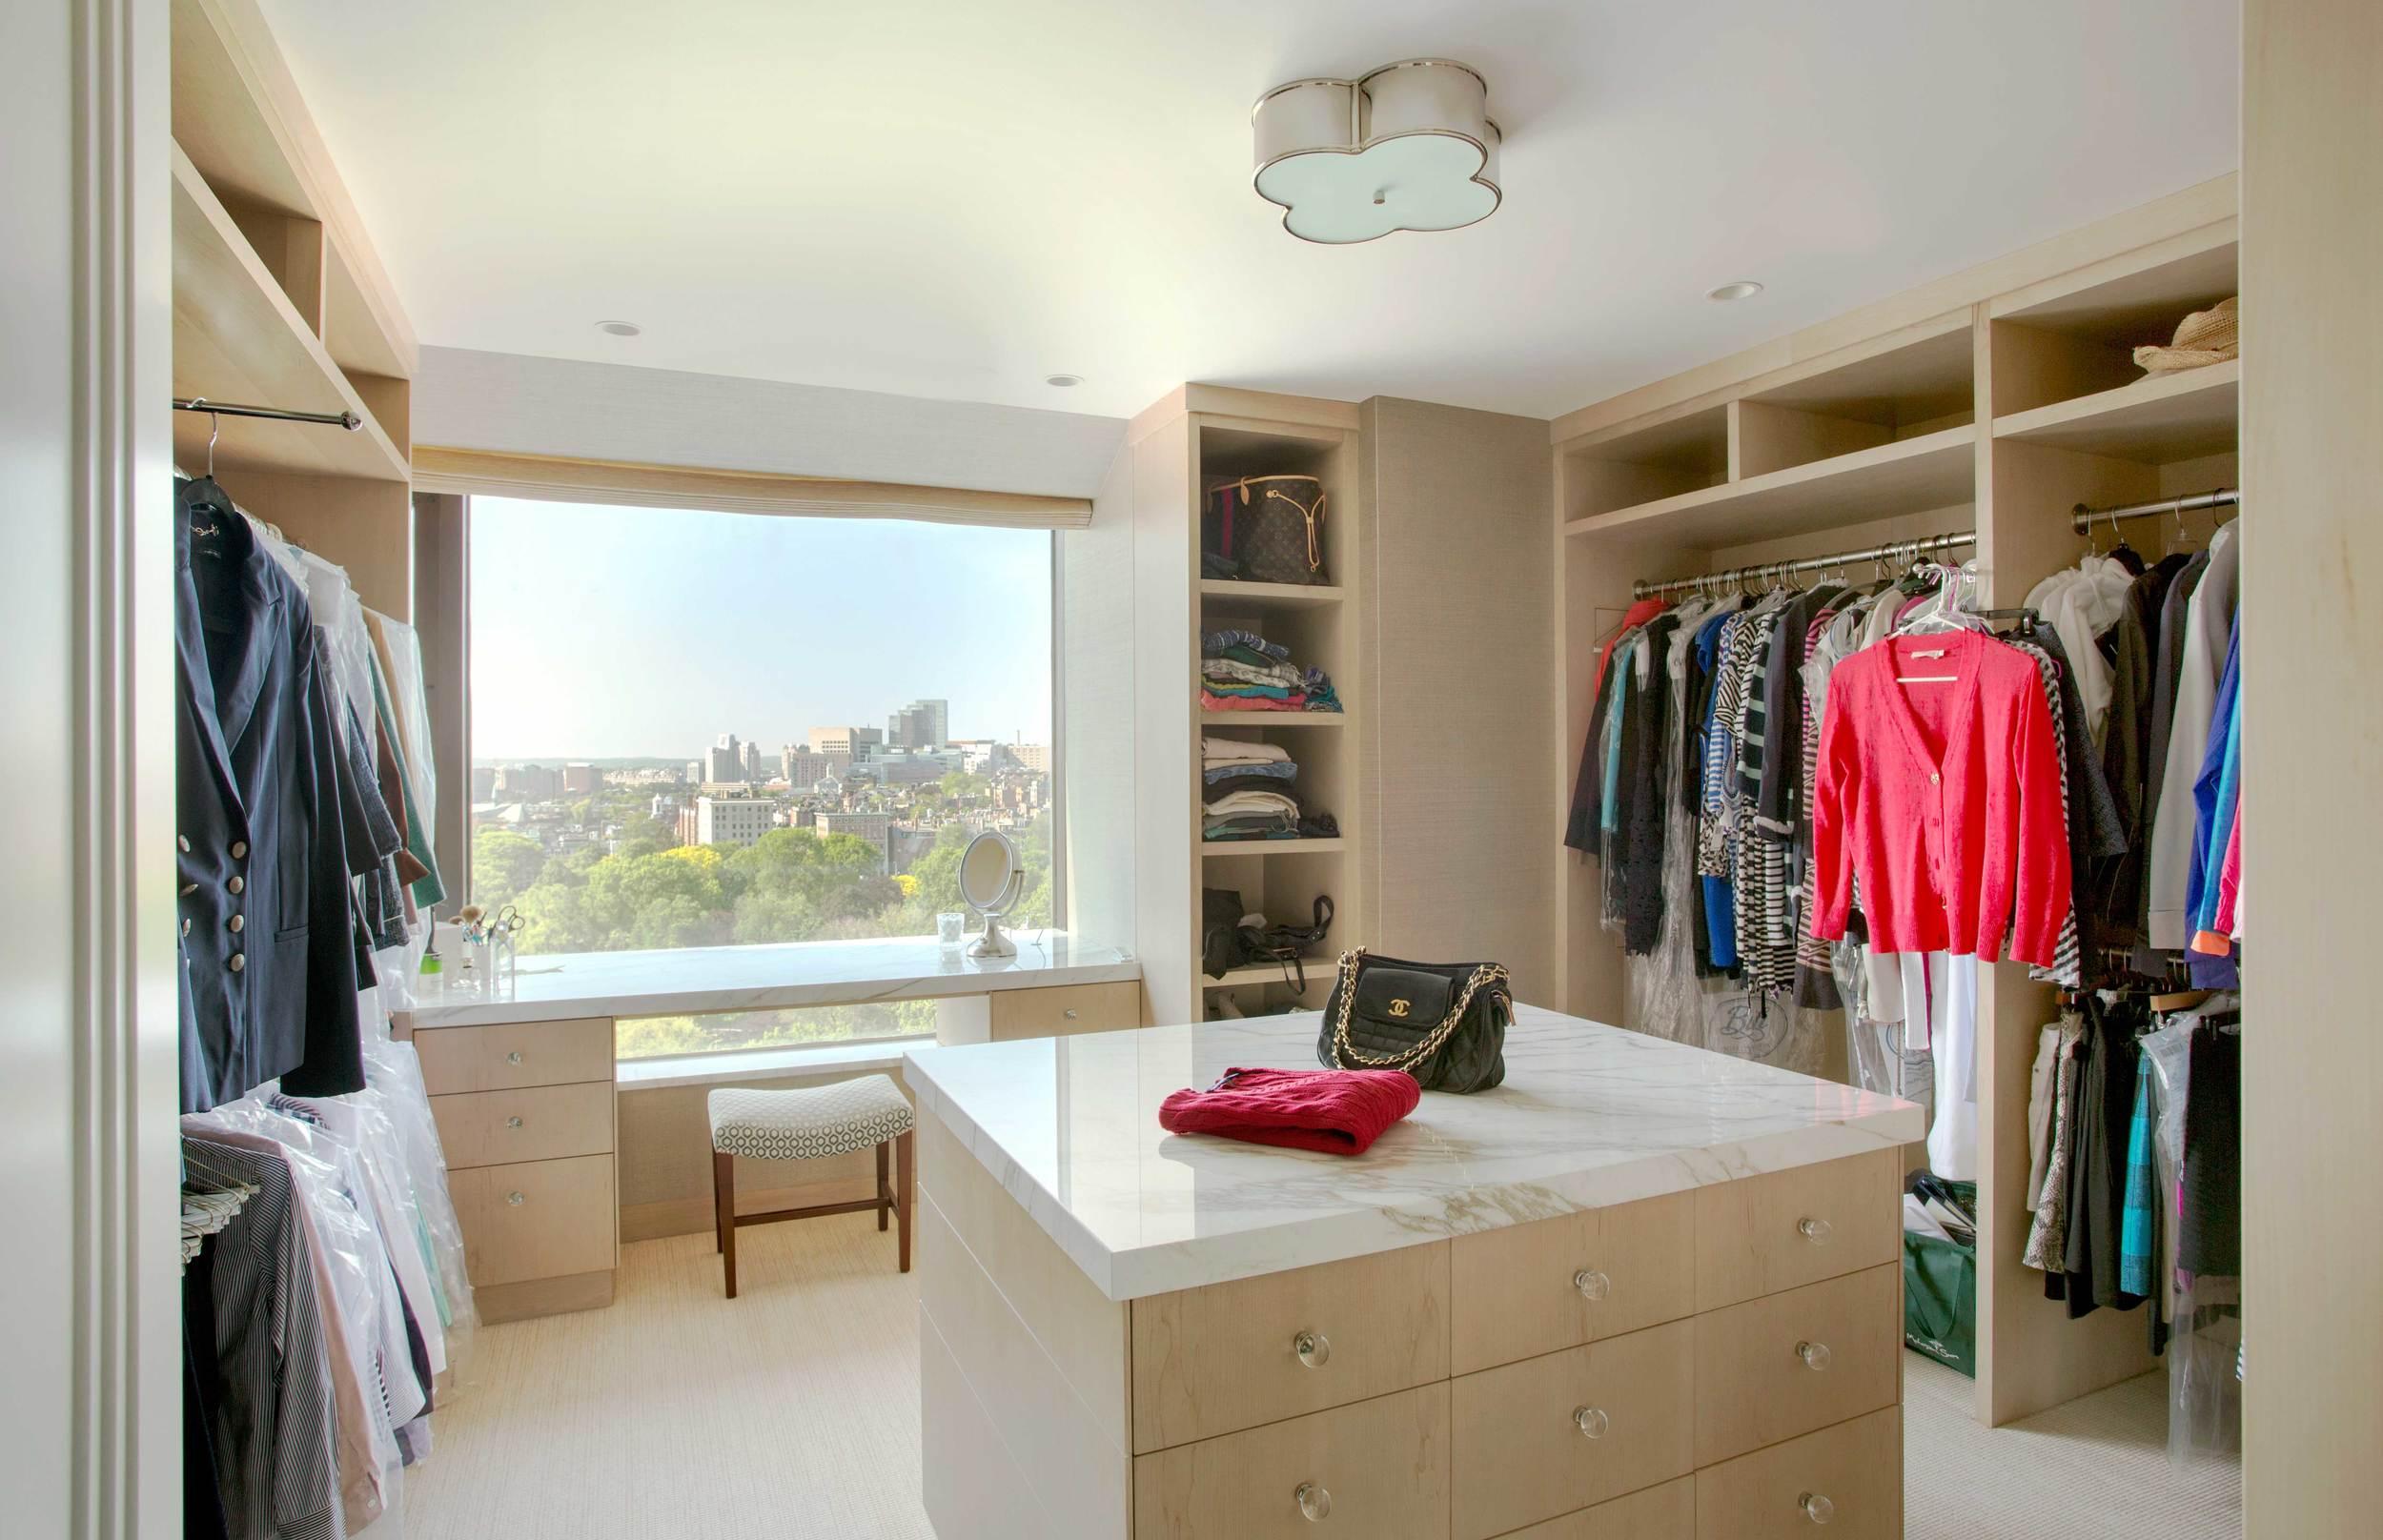 15-Angus-Beasley-closet-1.jpg